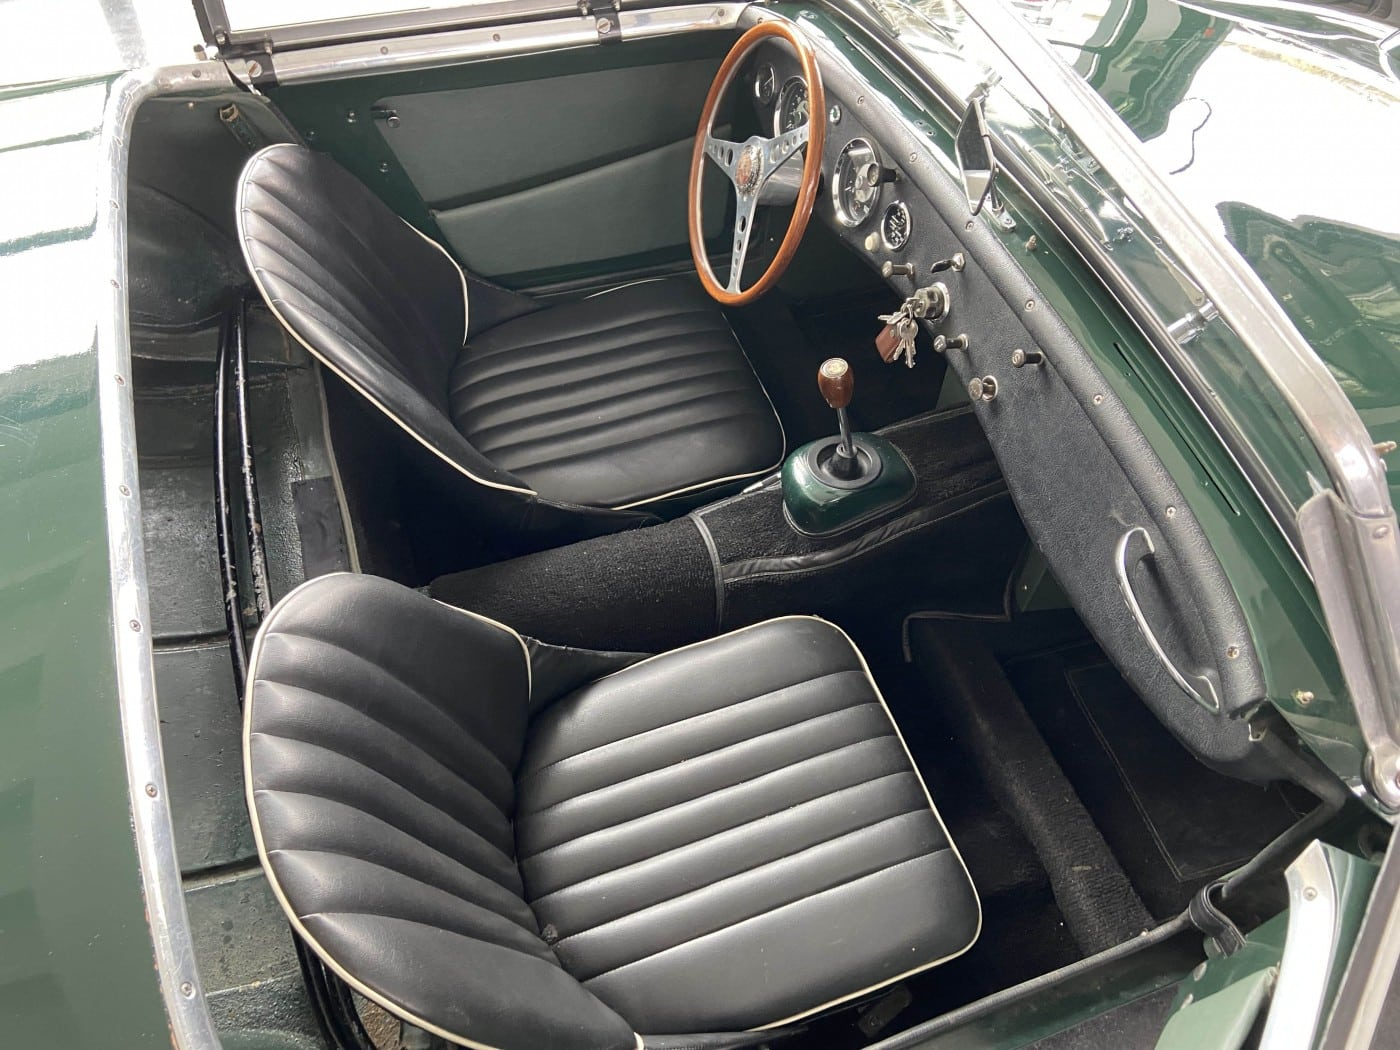 voiture-ancienne-cforcar-austin-frogeye-vhc-28